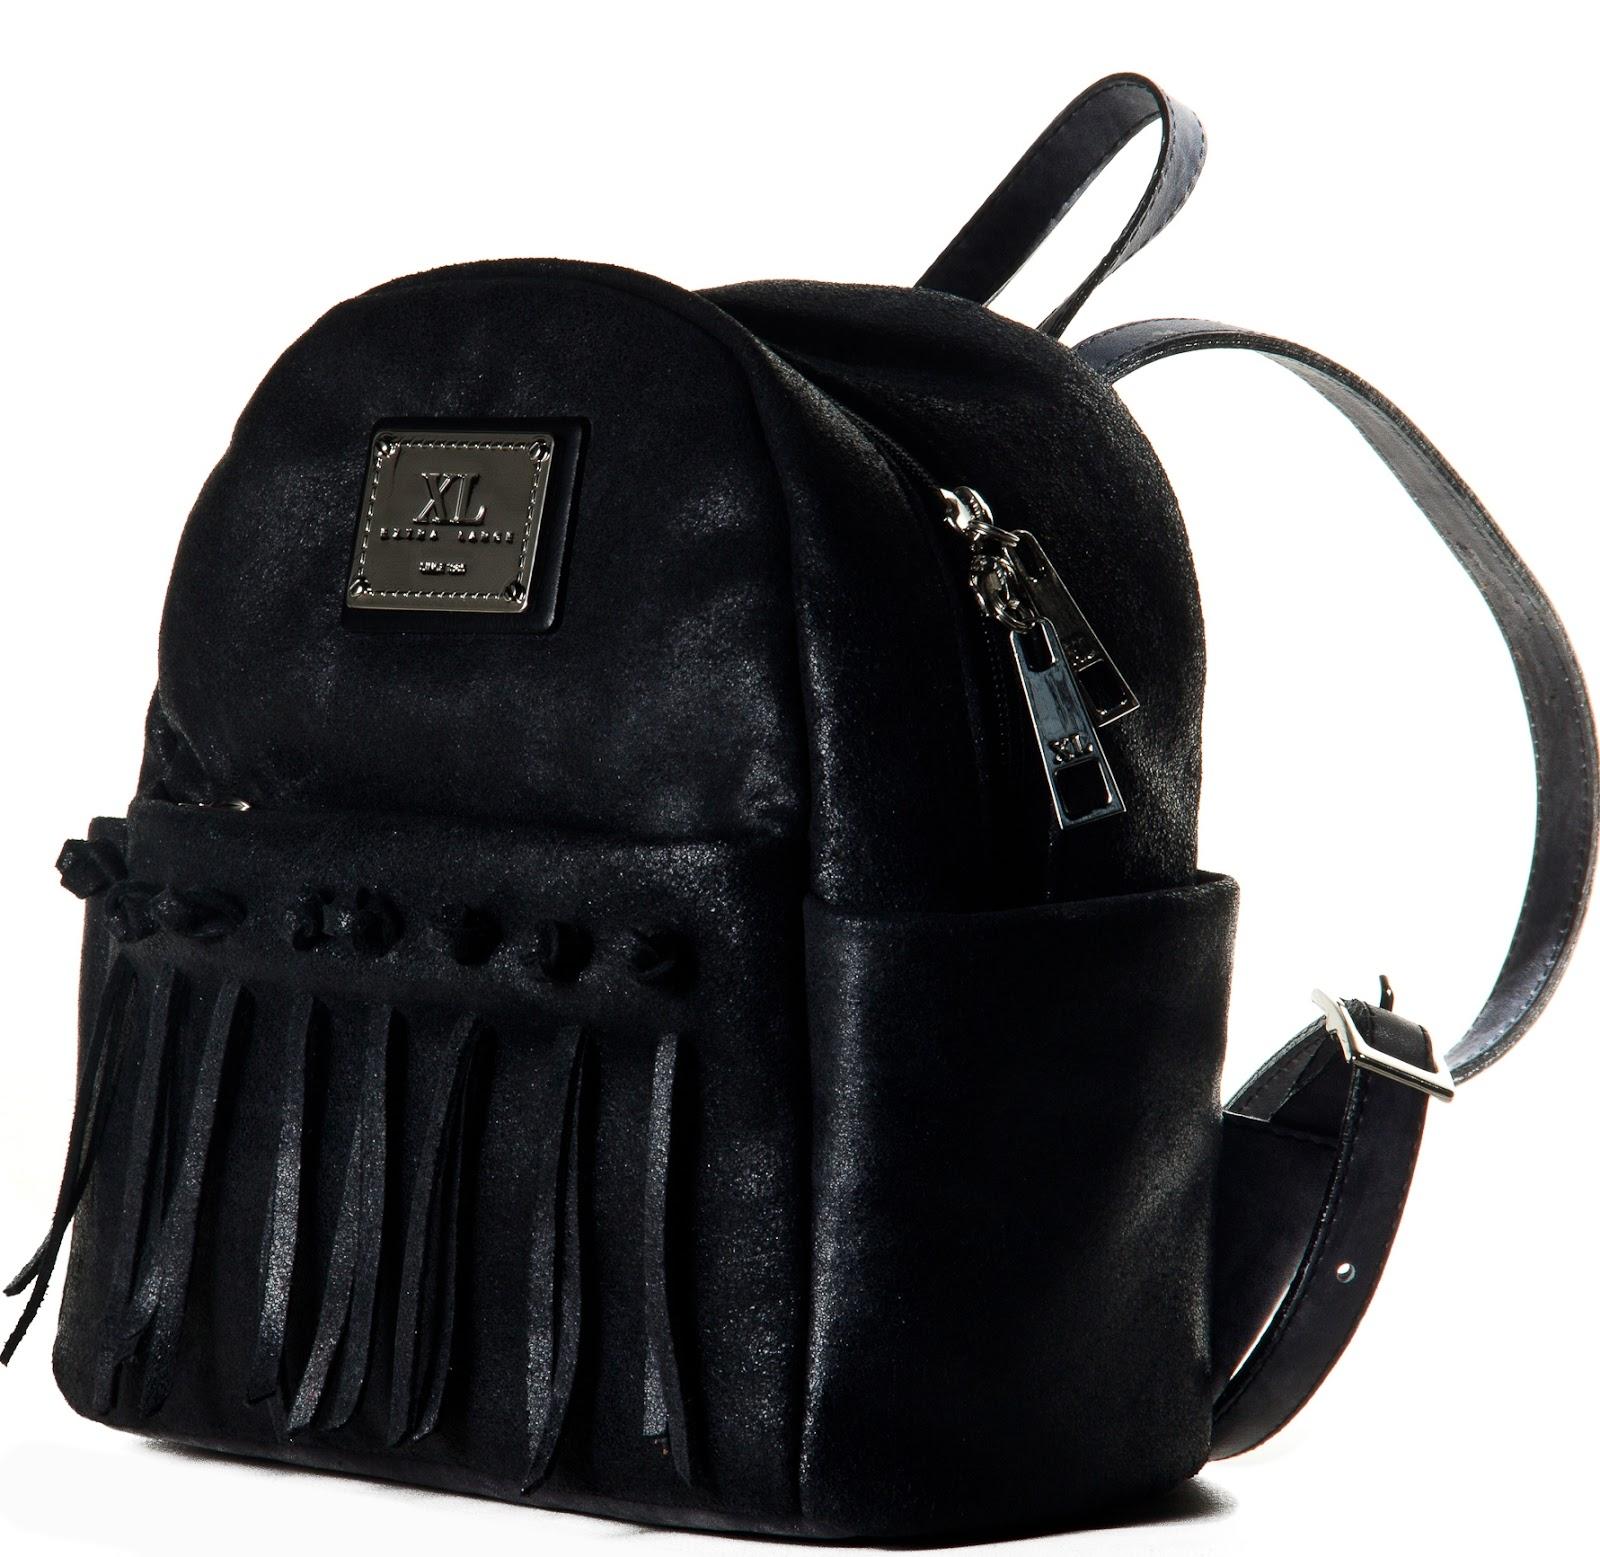 mochila,xl,negra,blog,bolsos,carteras